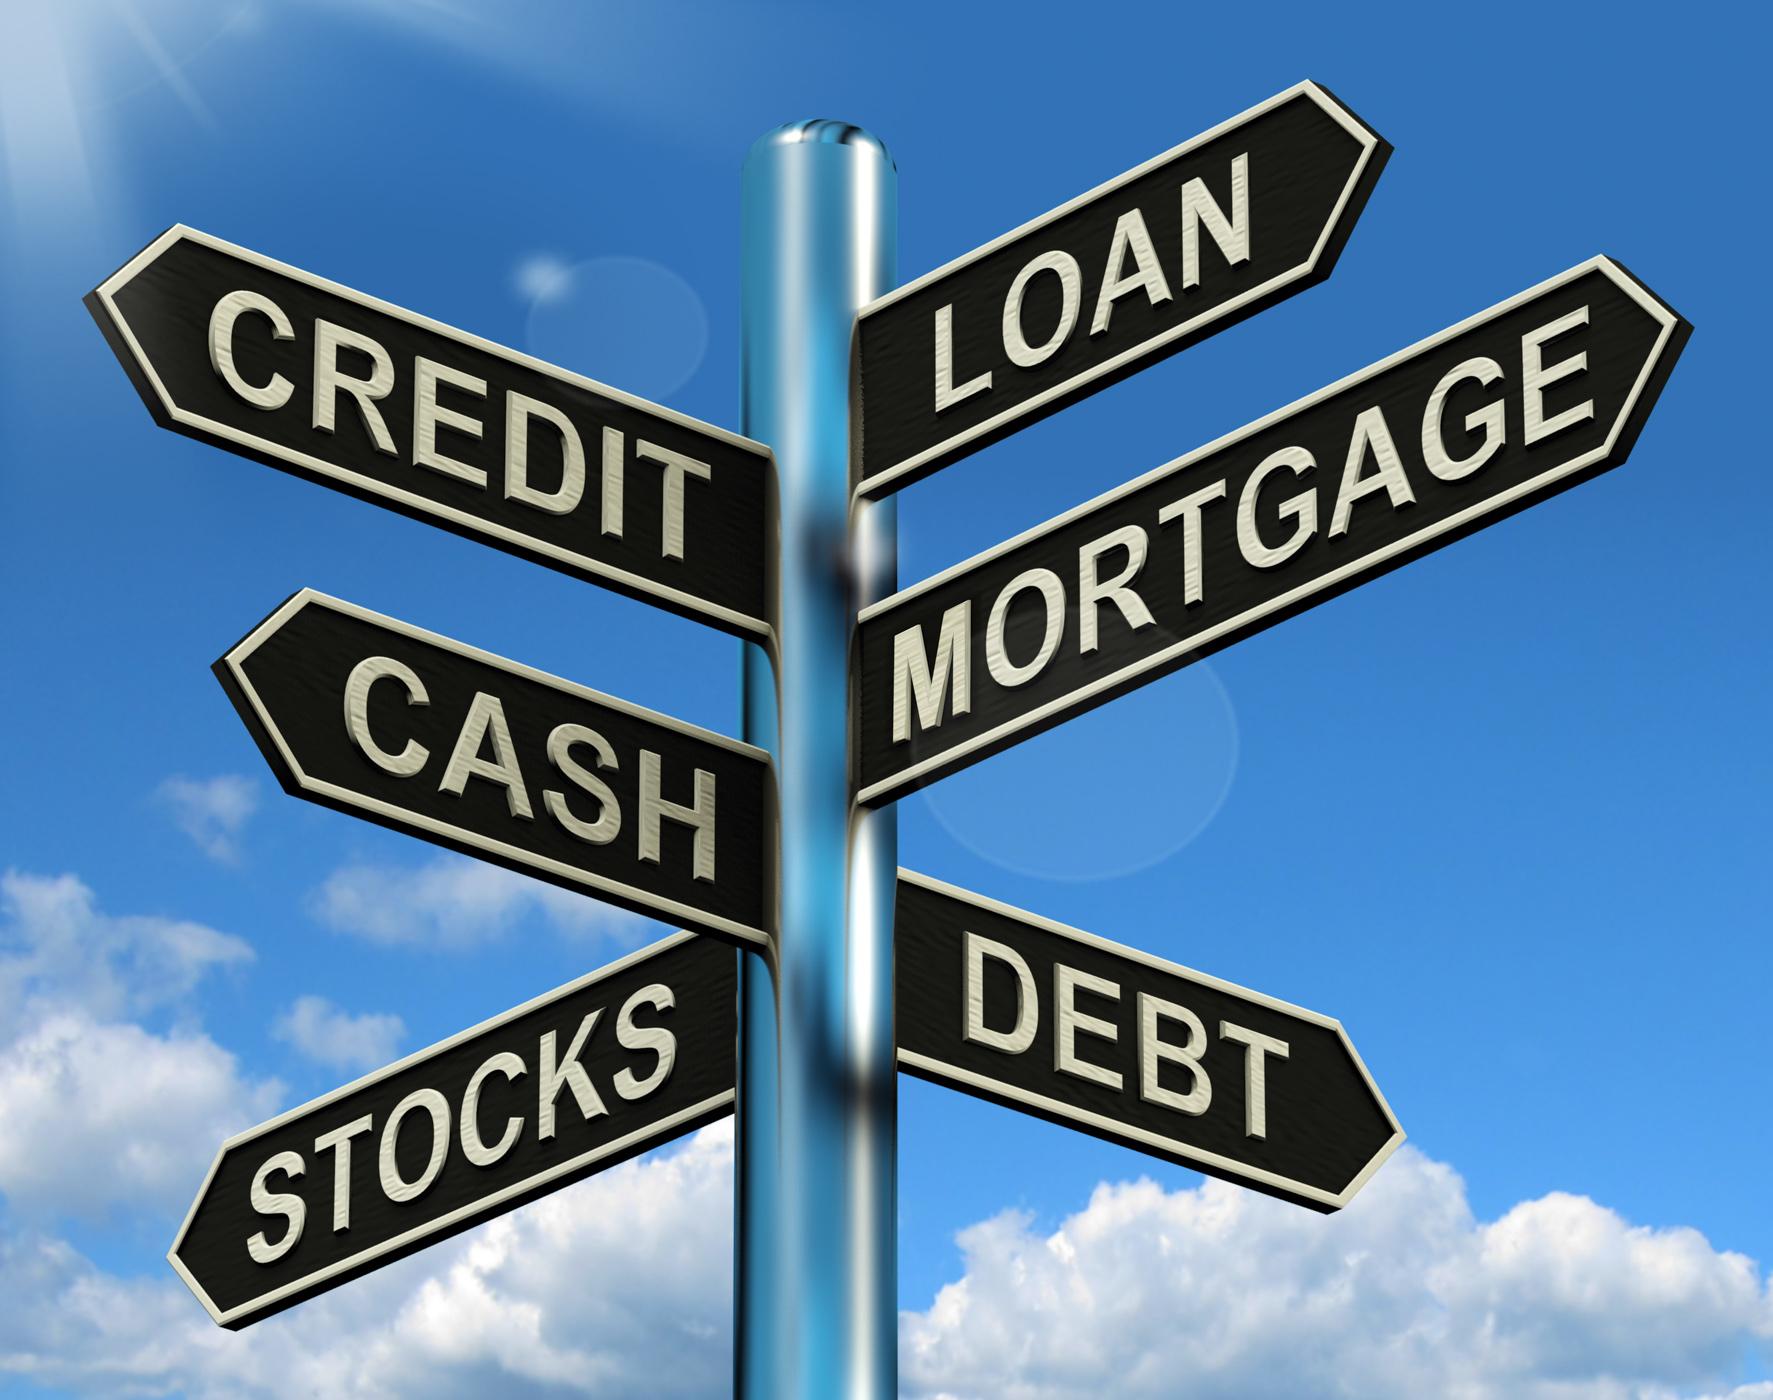 Credit Loan Mortgage Signpost Showing Borrowing Finance And Debt, Advance, Application, Borrow, Borrowing, HQ Photo